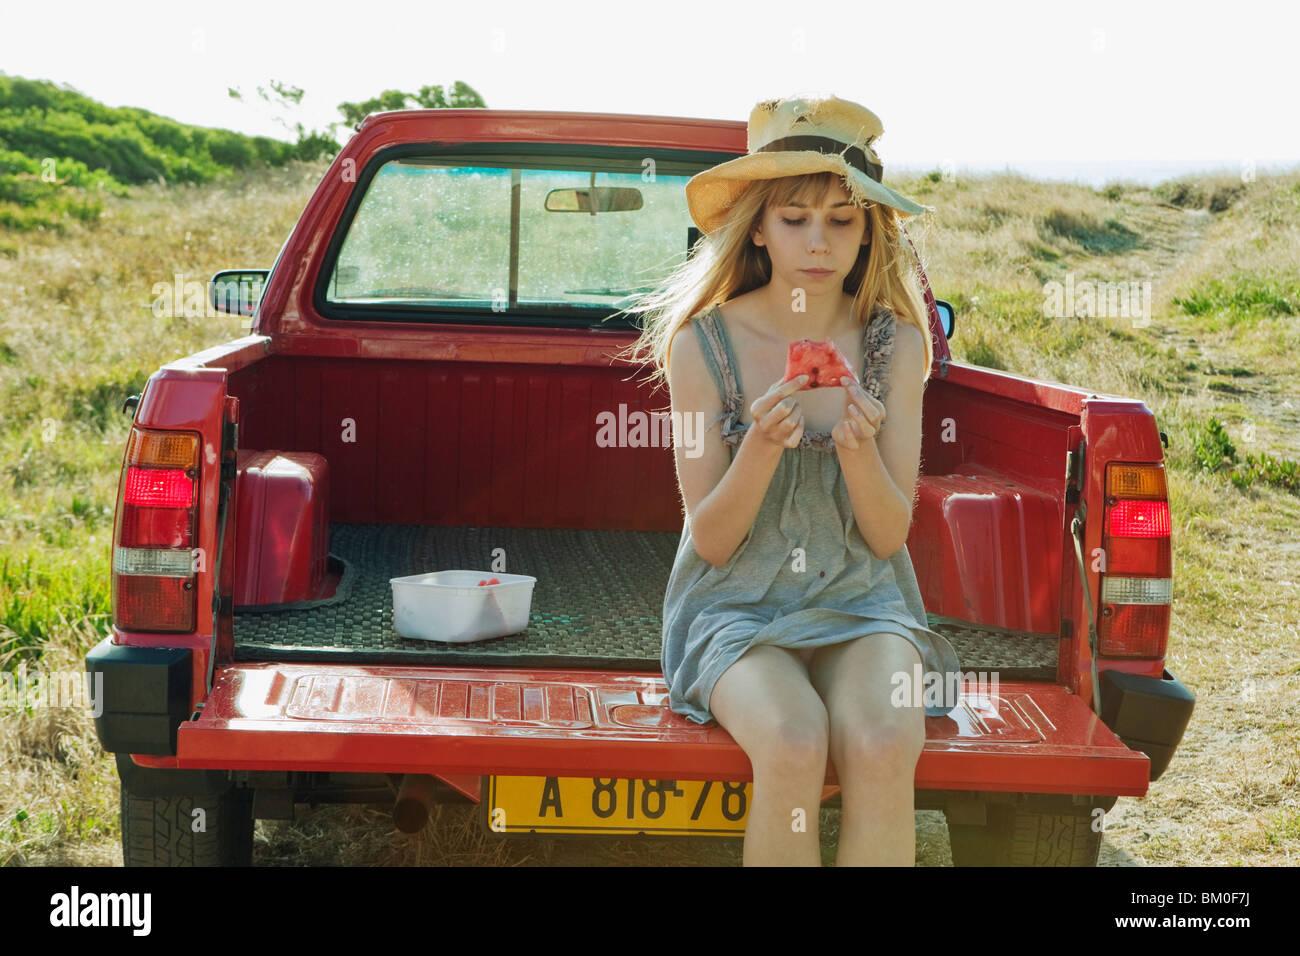 Girl eating watermelon on back of truck - Stock Image